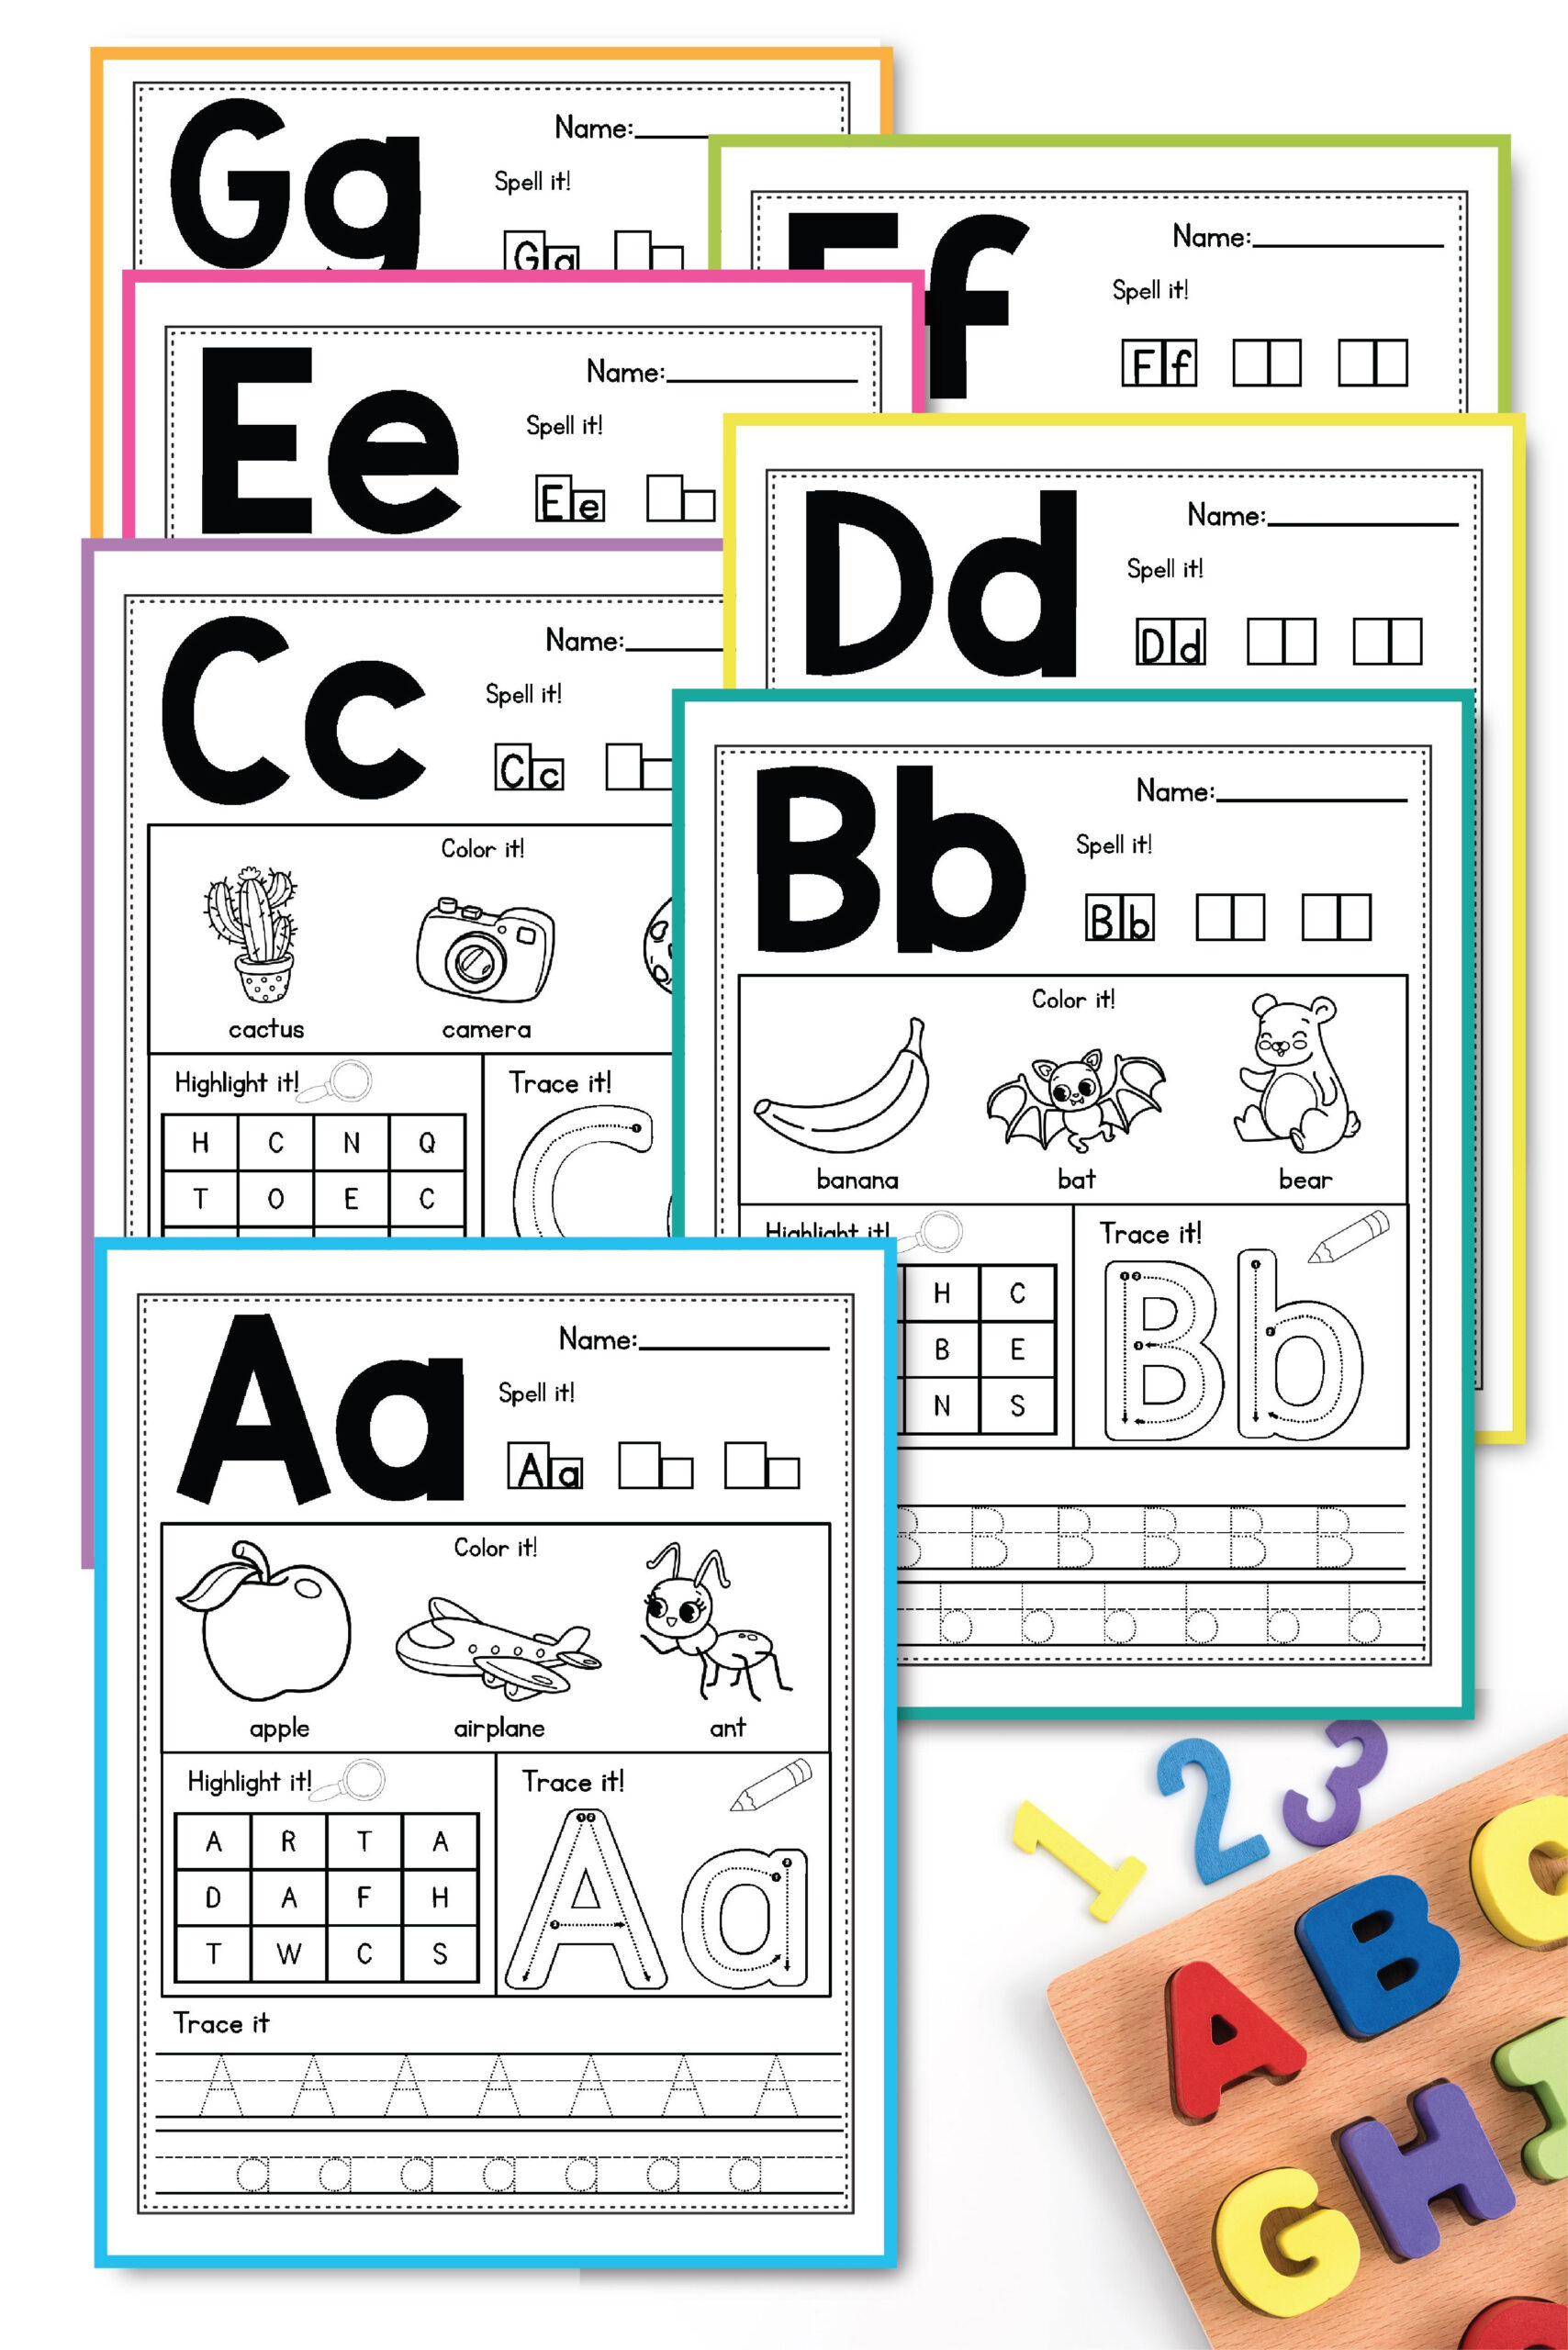 Alphabet Worksheets A-Z Beginning Sounds Activities with Reading A-Z Alphabet Worksheets